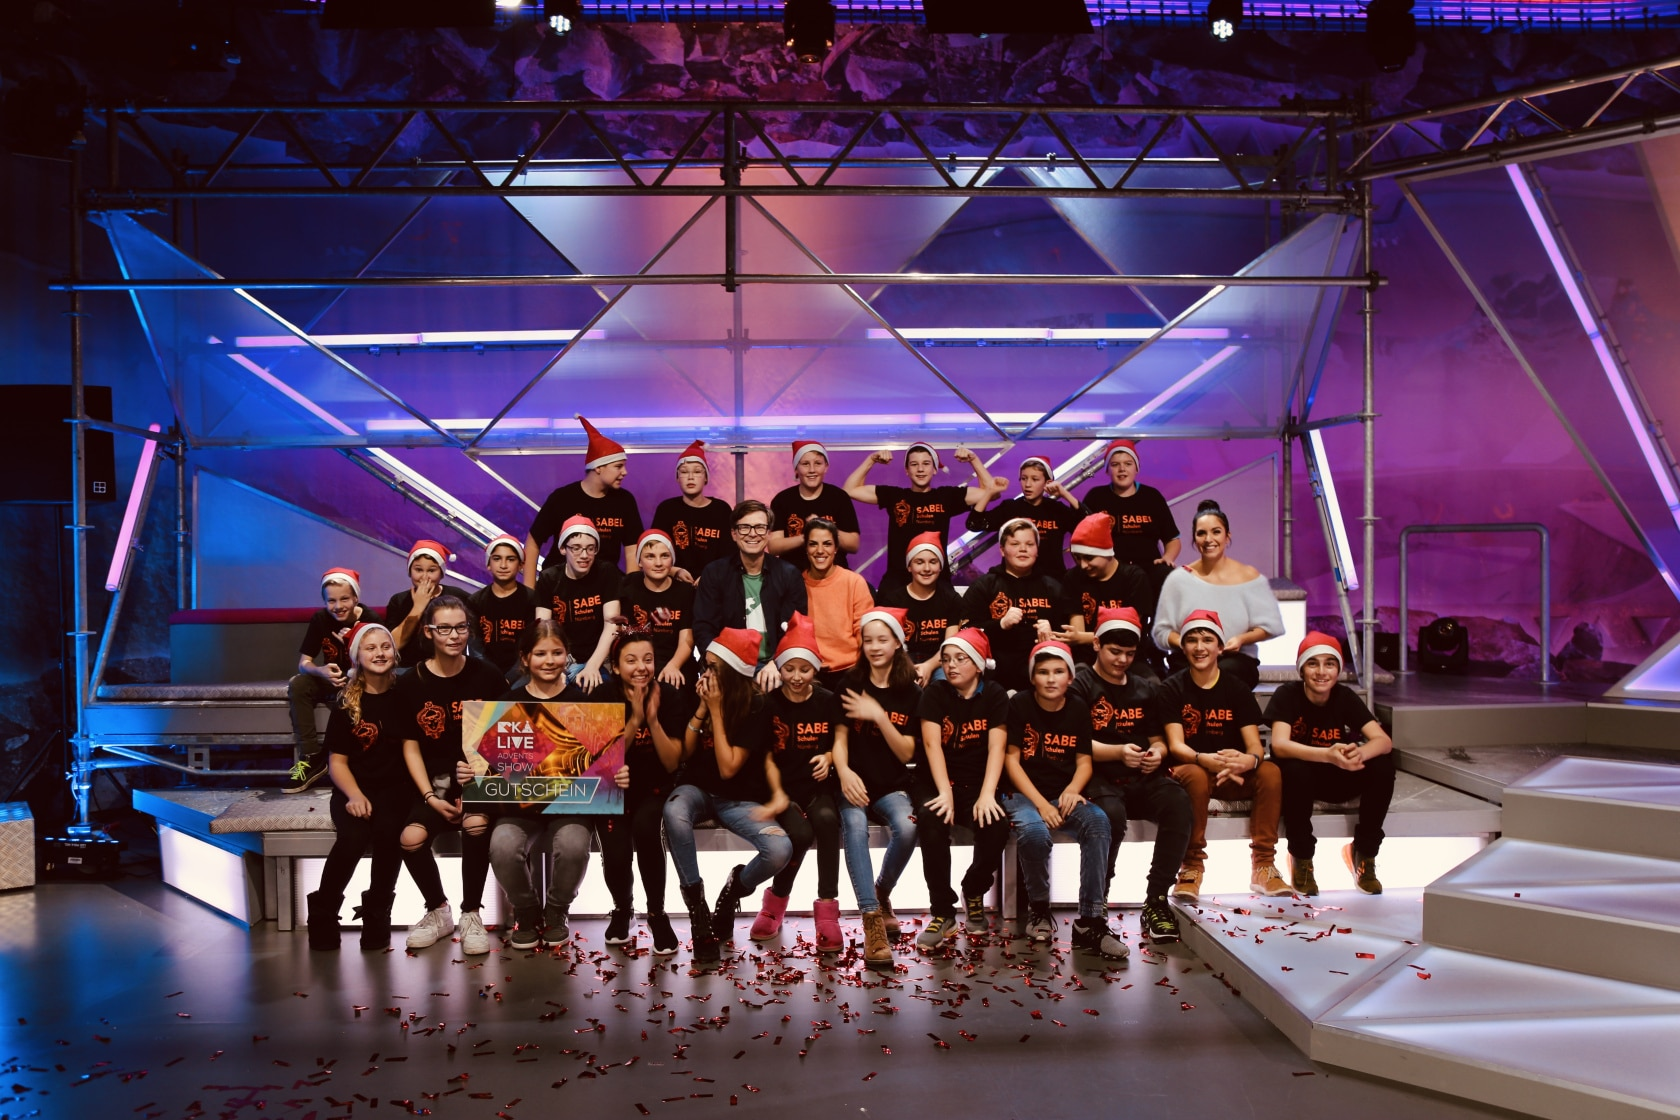 Schüler der SABEL Realschule sind Sieger der KIKA Adventsshow